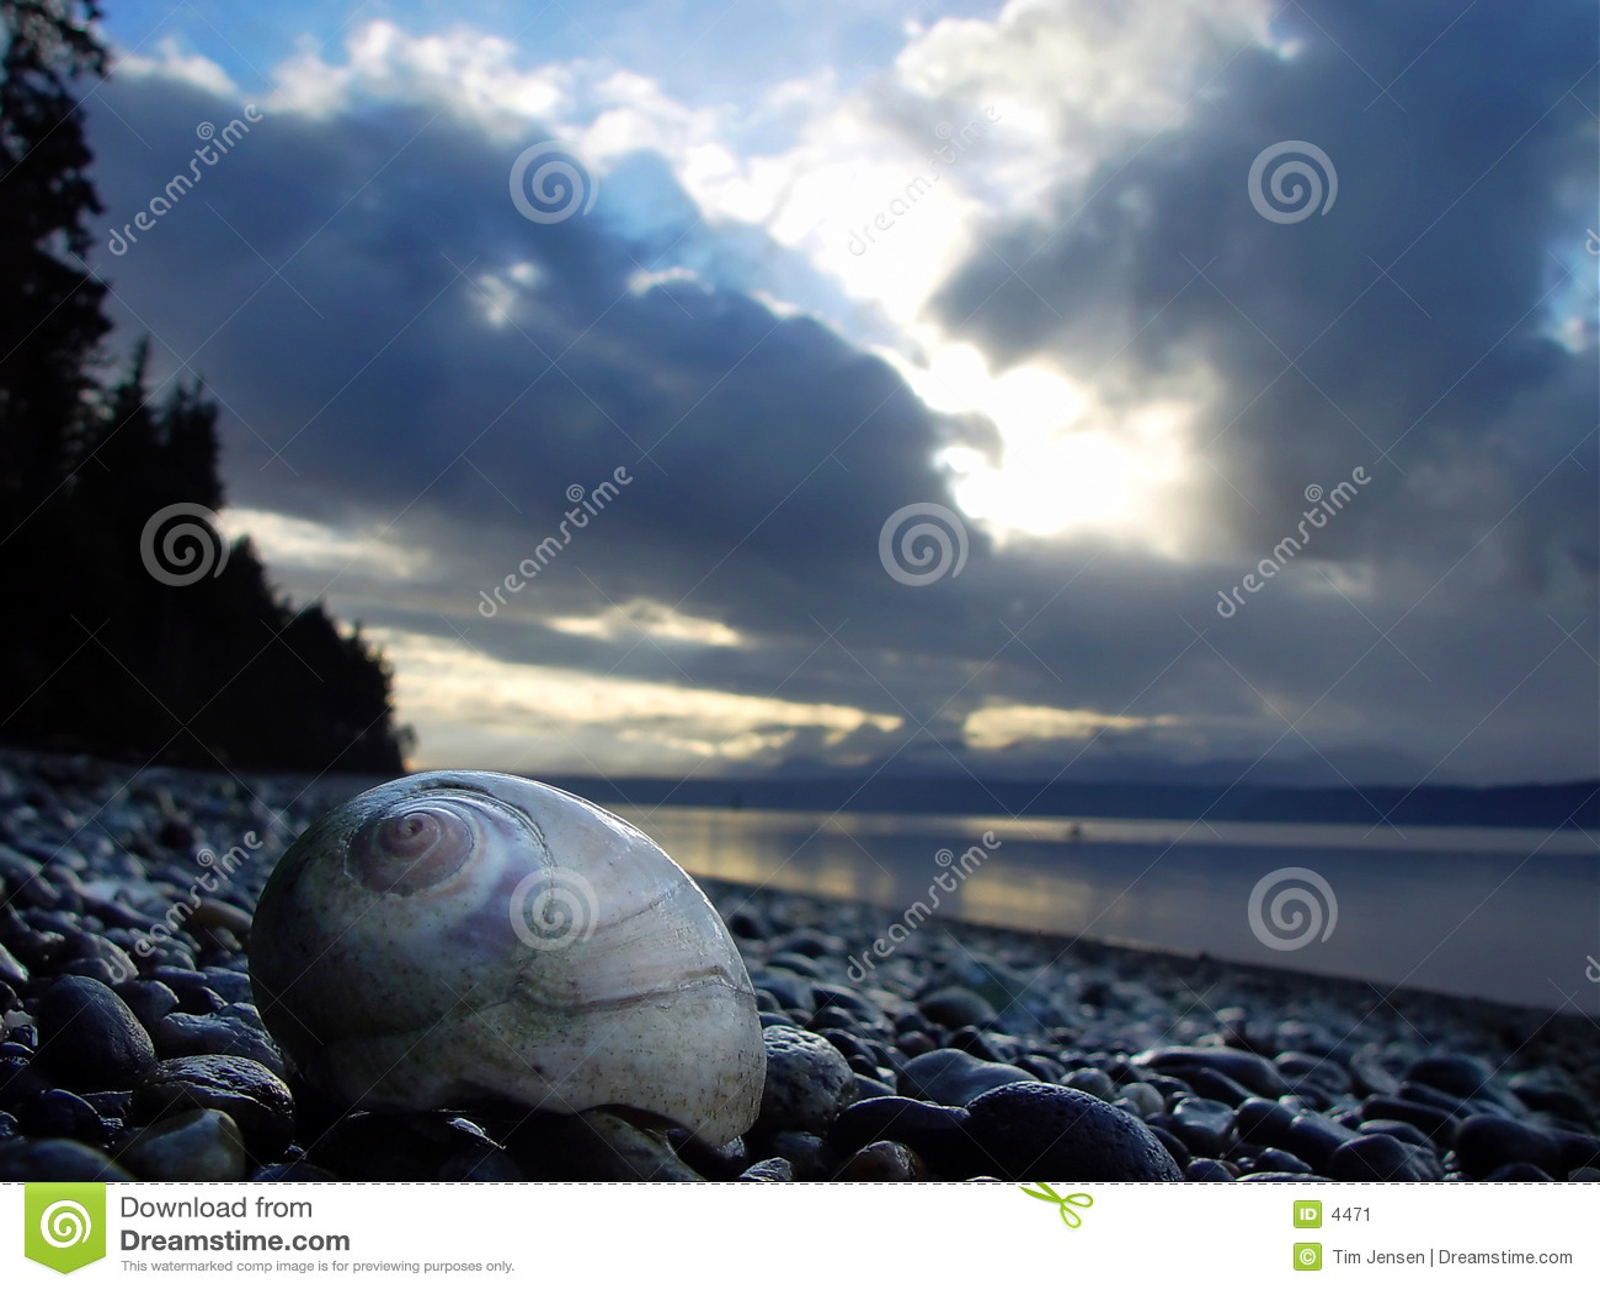 Moonshell on beach